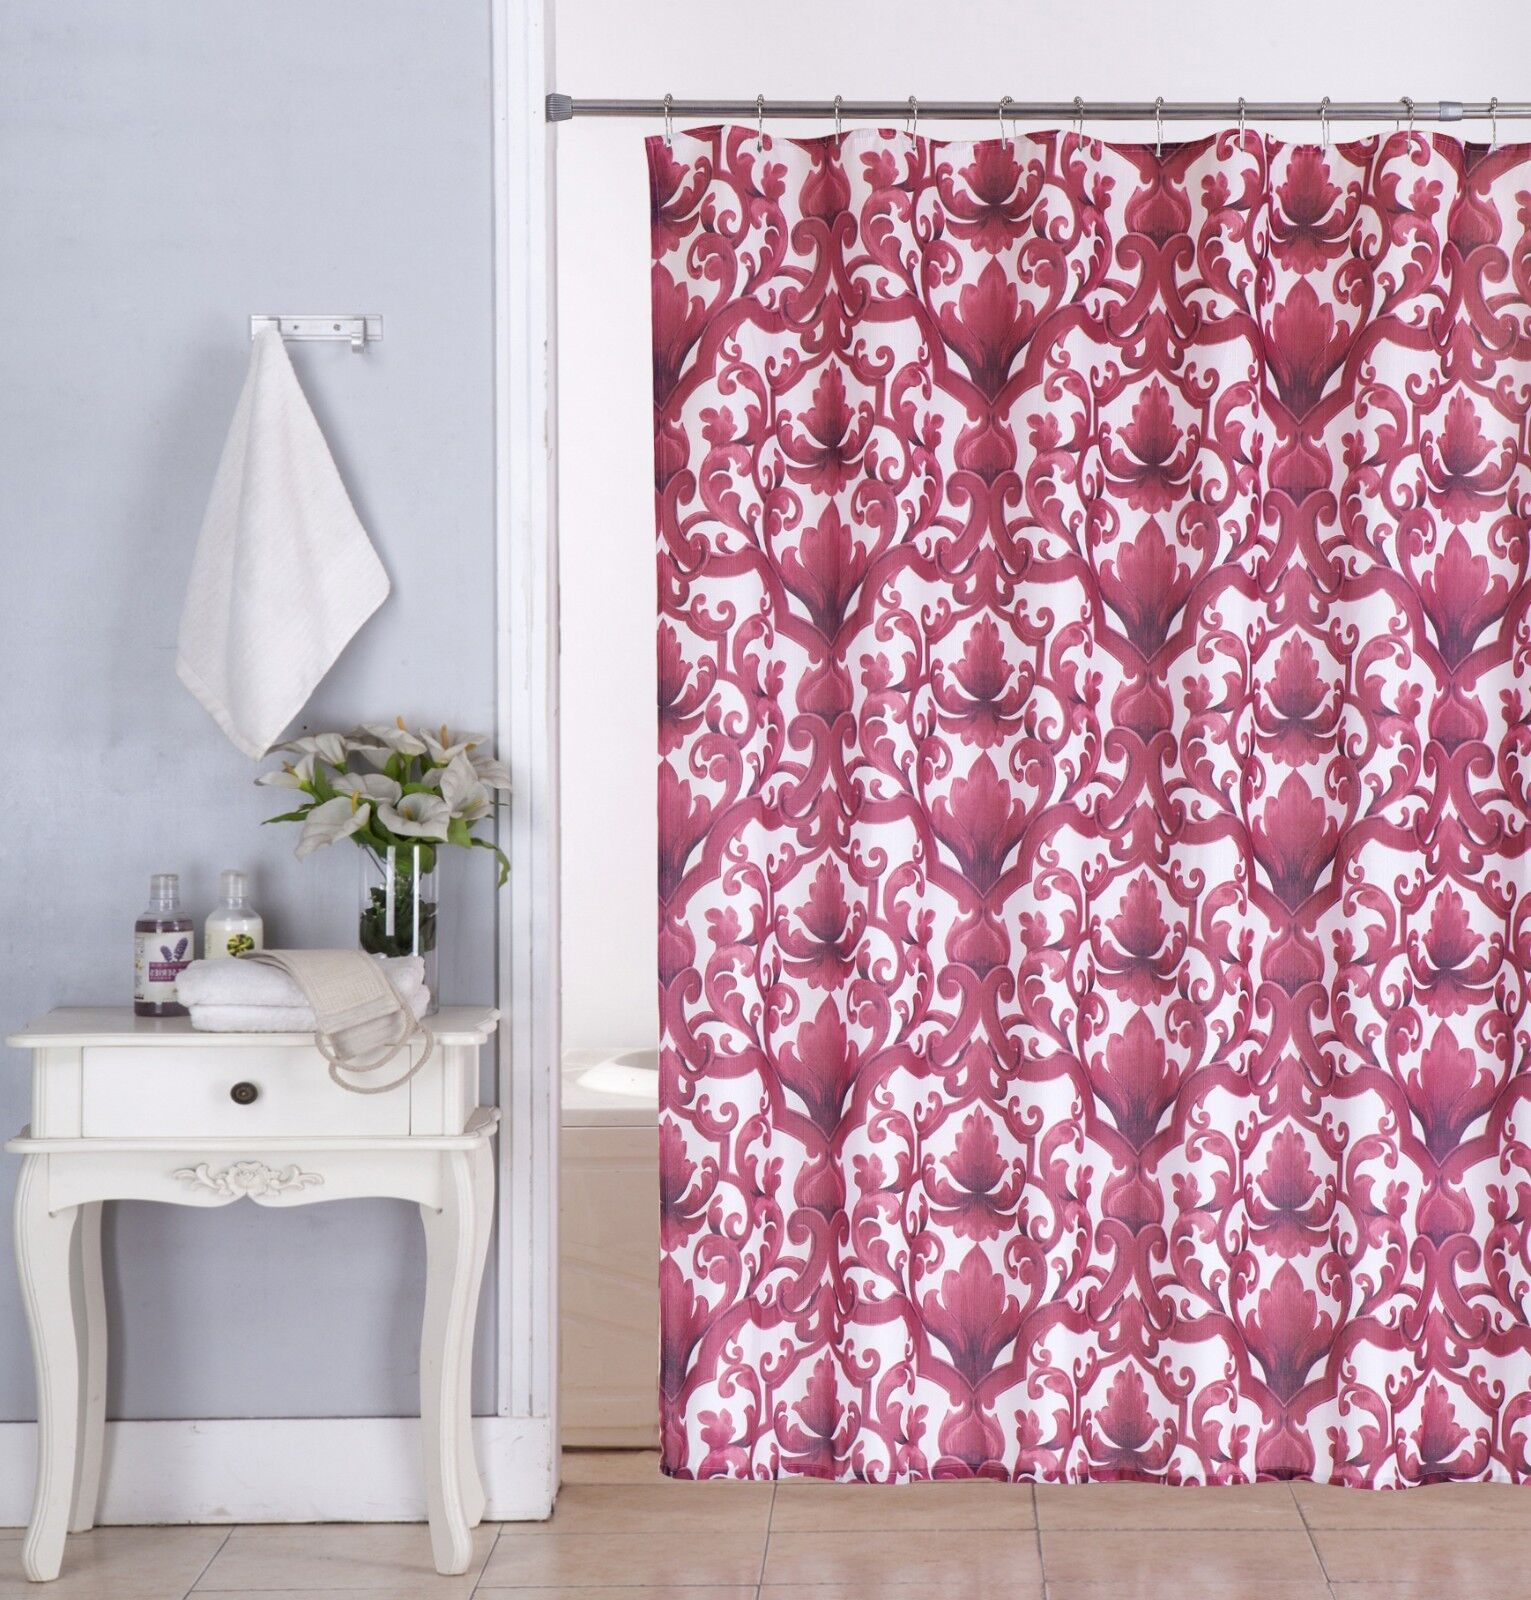 Details About Ariel 70 X70 Fabric Canvas Shower Curtain Roller Hooks Set Burgundy